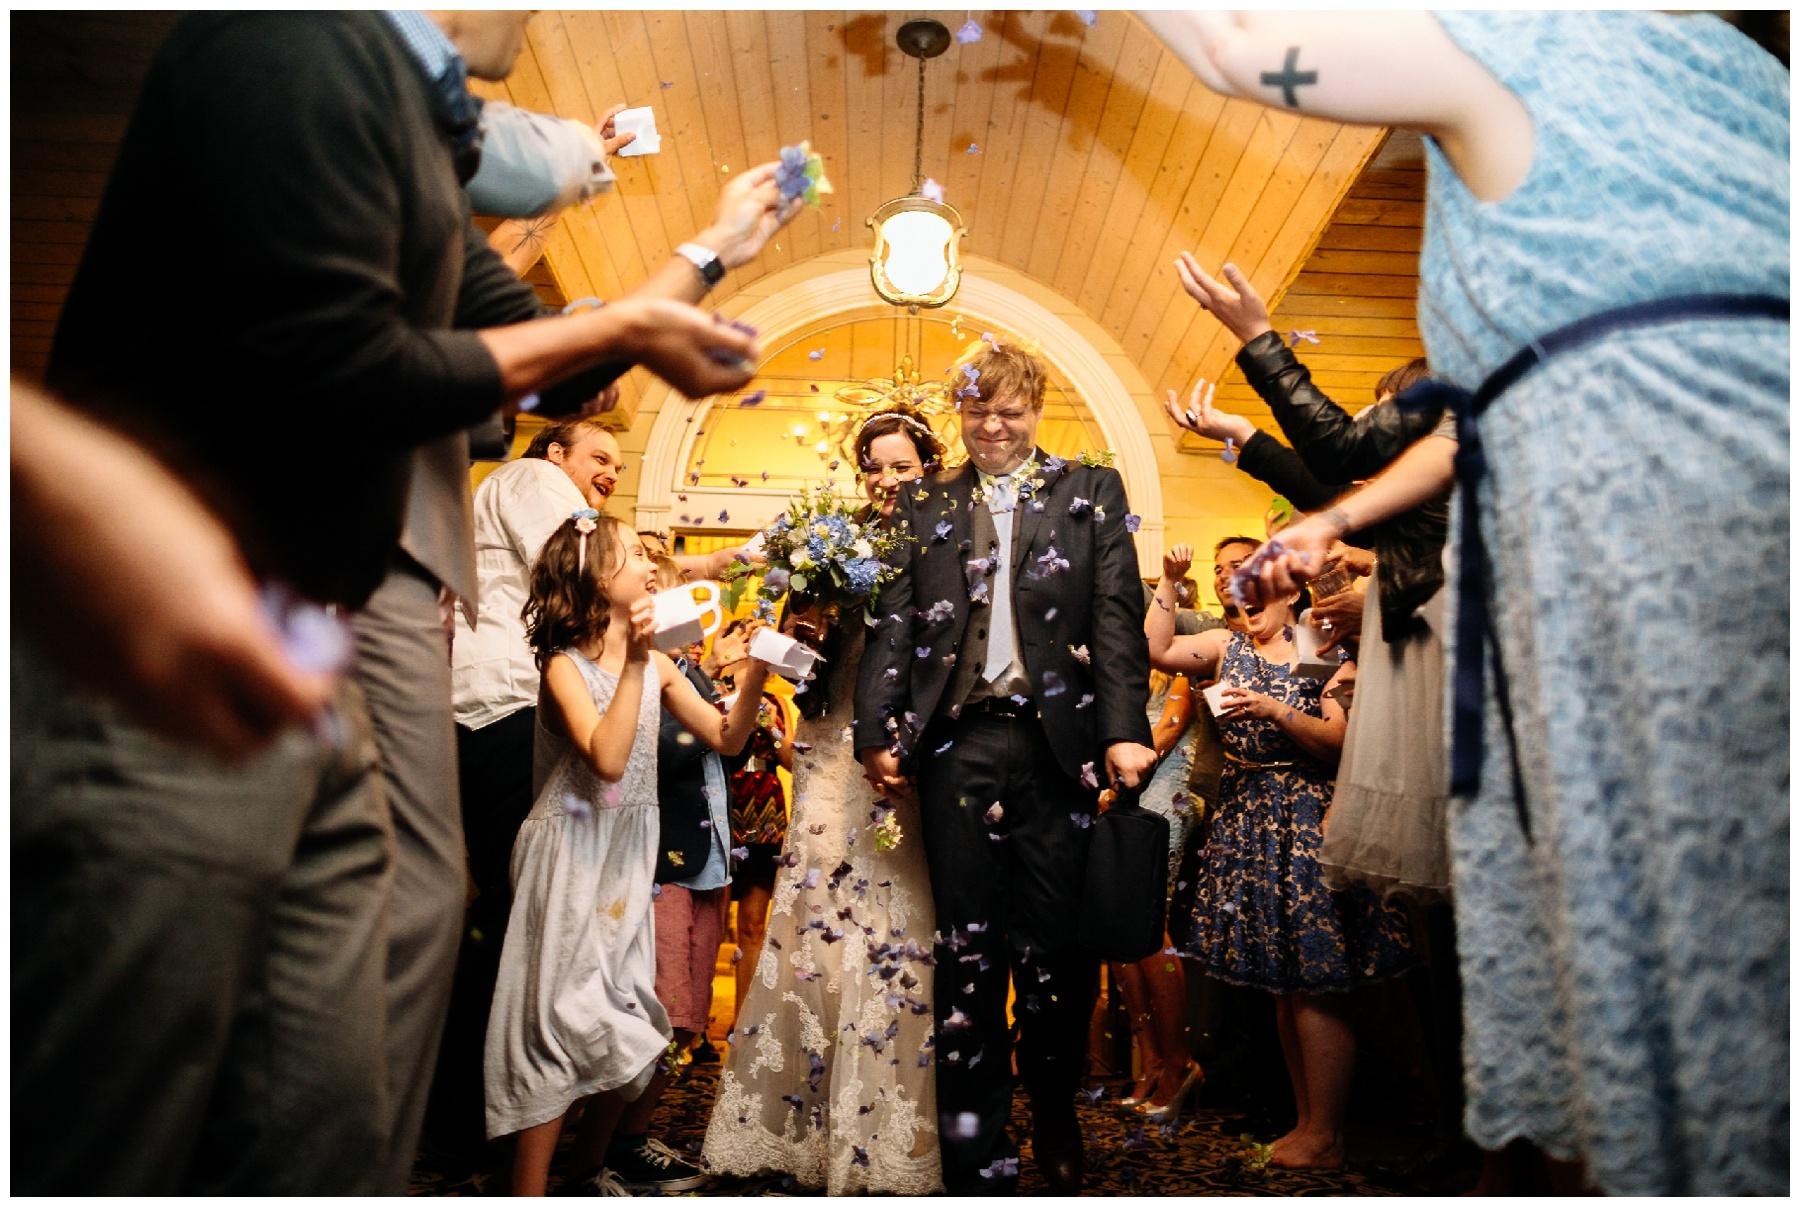 flower exit The Grand Willow Inn wedding